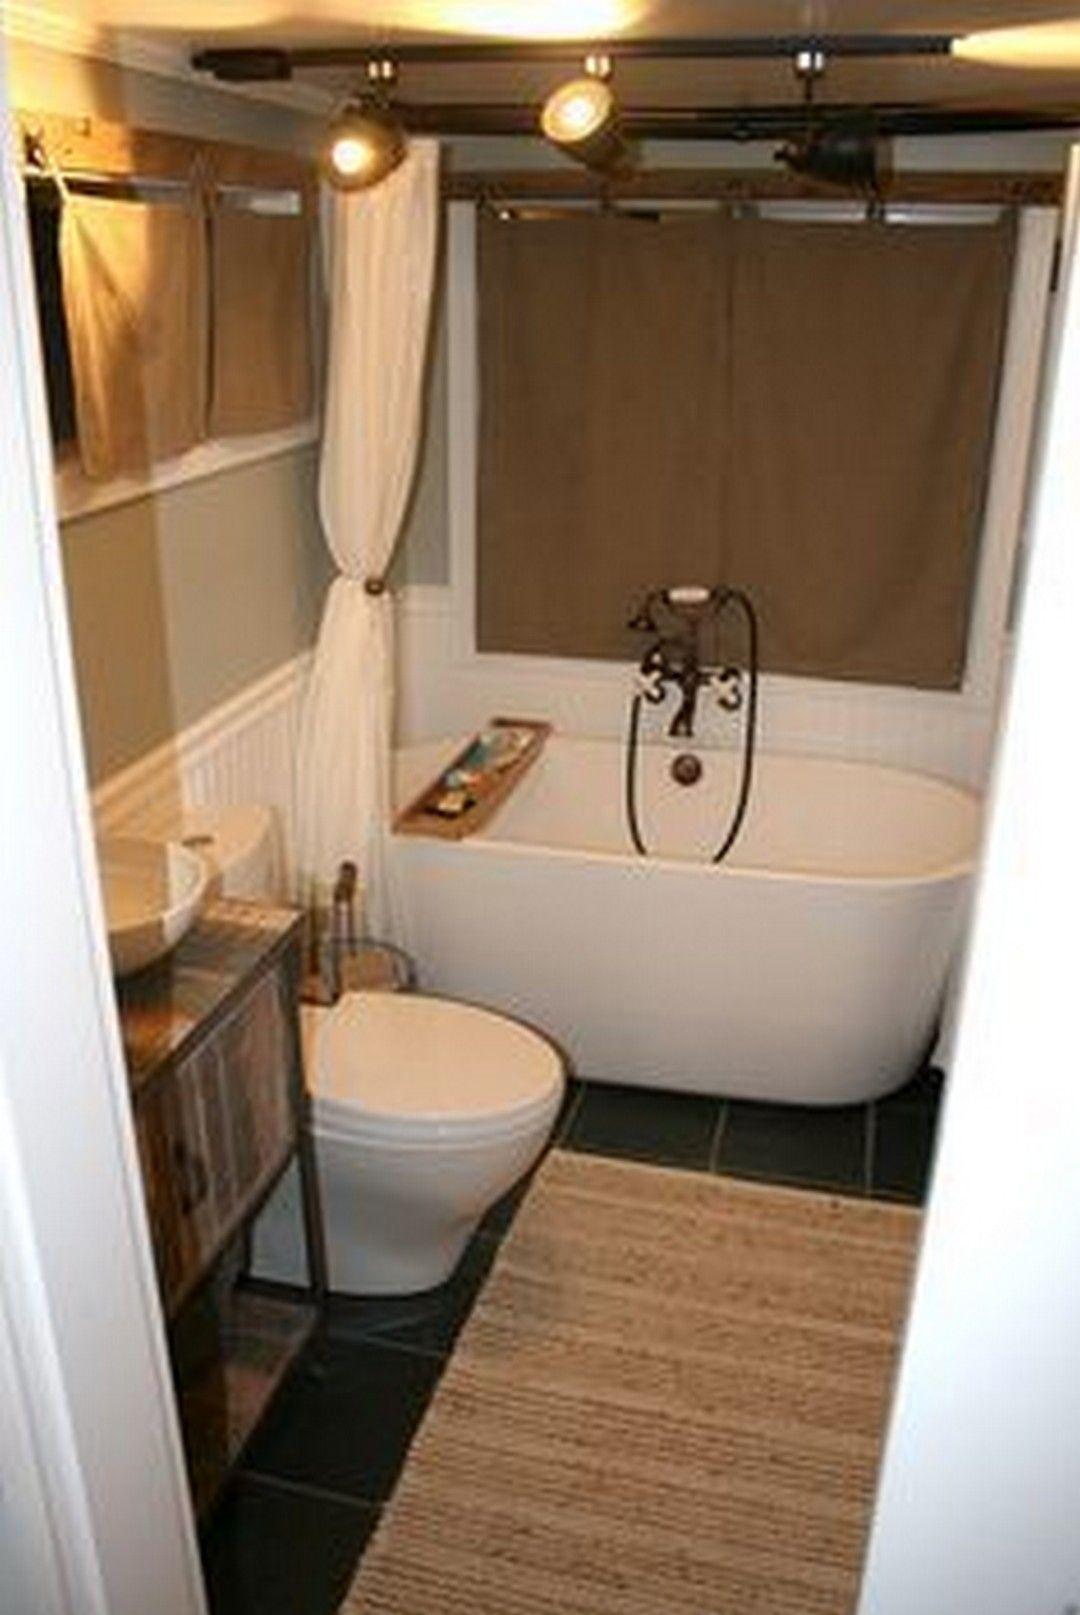 Cool tiny house bathtub small space ideas inspirational photos